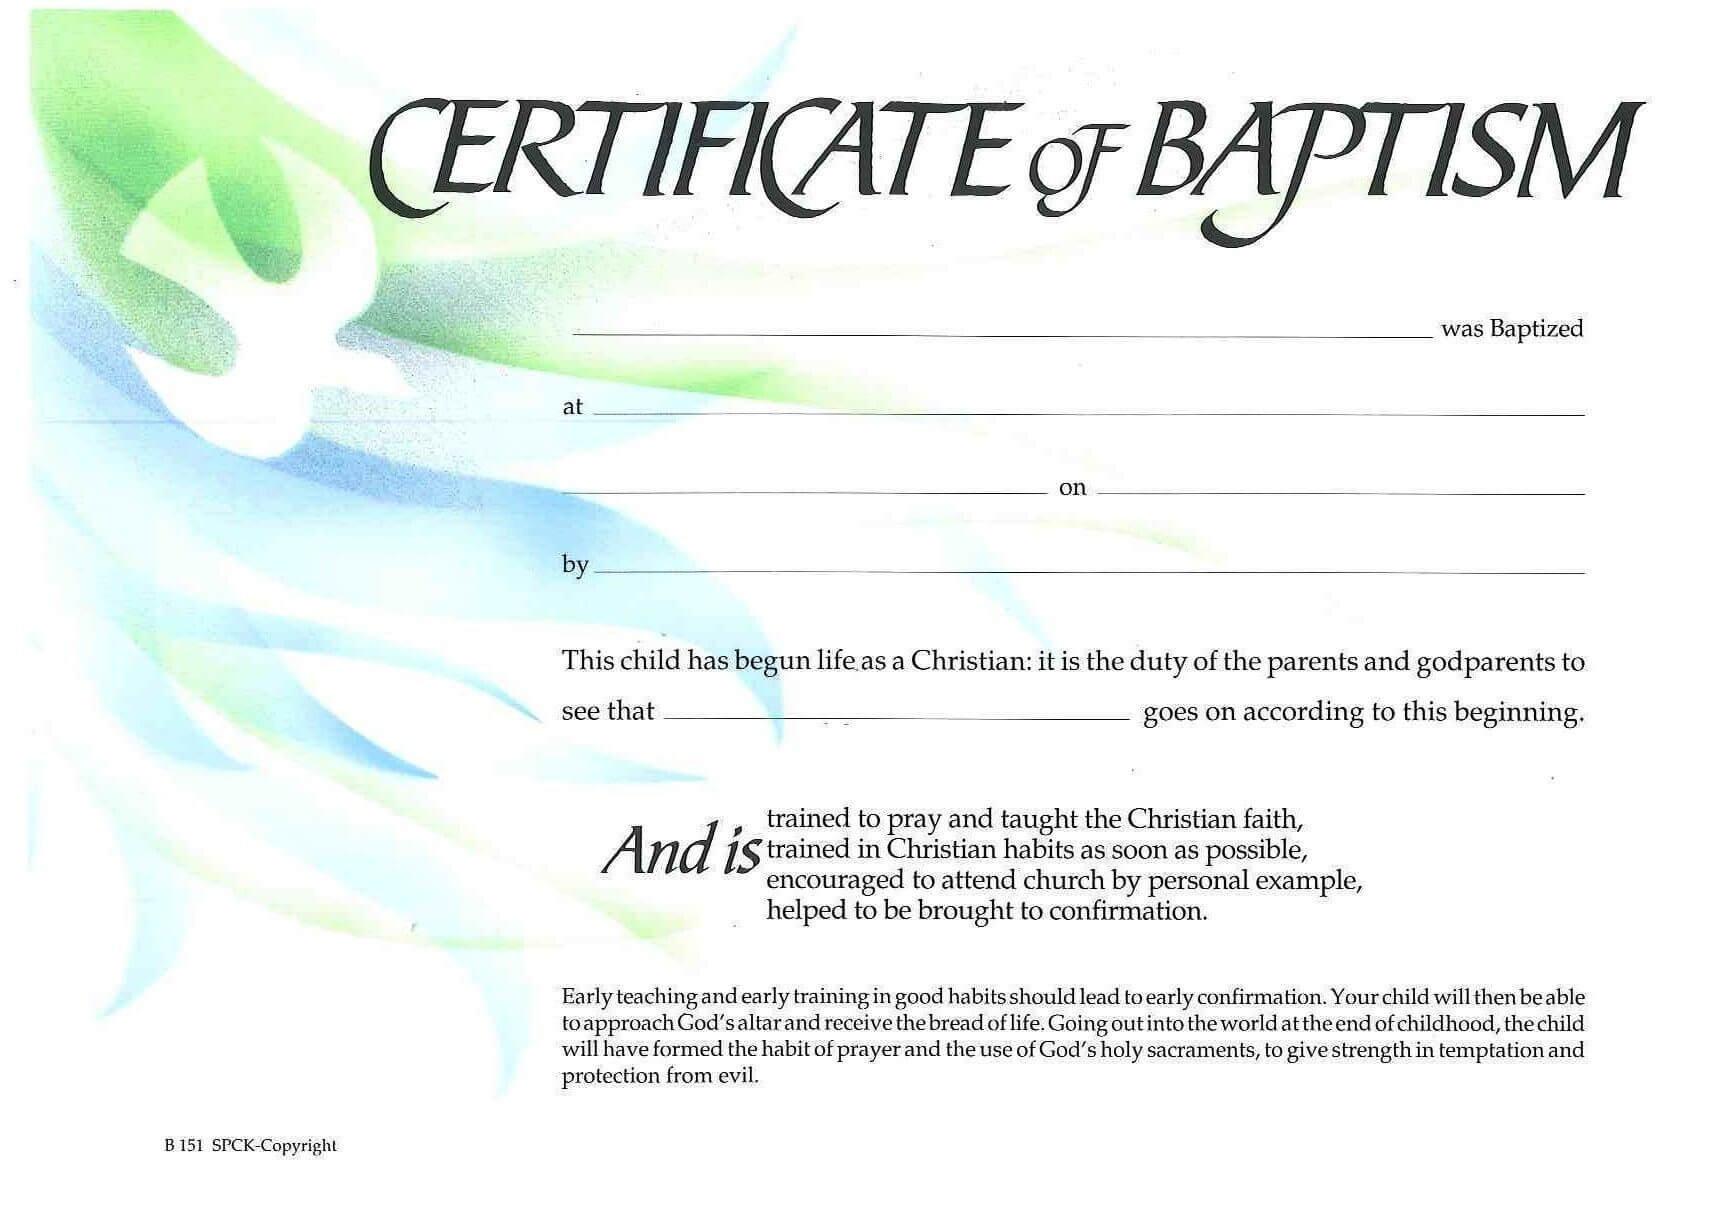 Baptism Certificate Xp4Eamuz | Certificate Templates, Baby regarding Christian Baptism Certificate Template